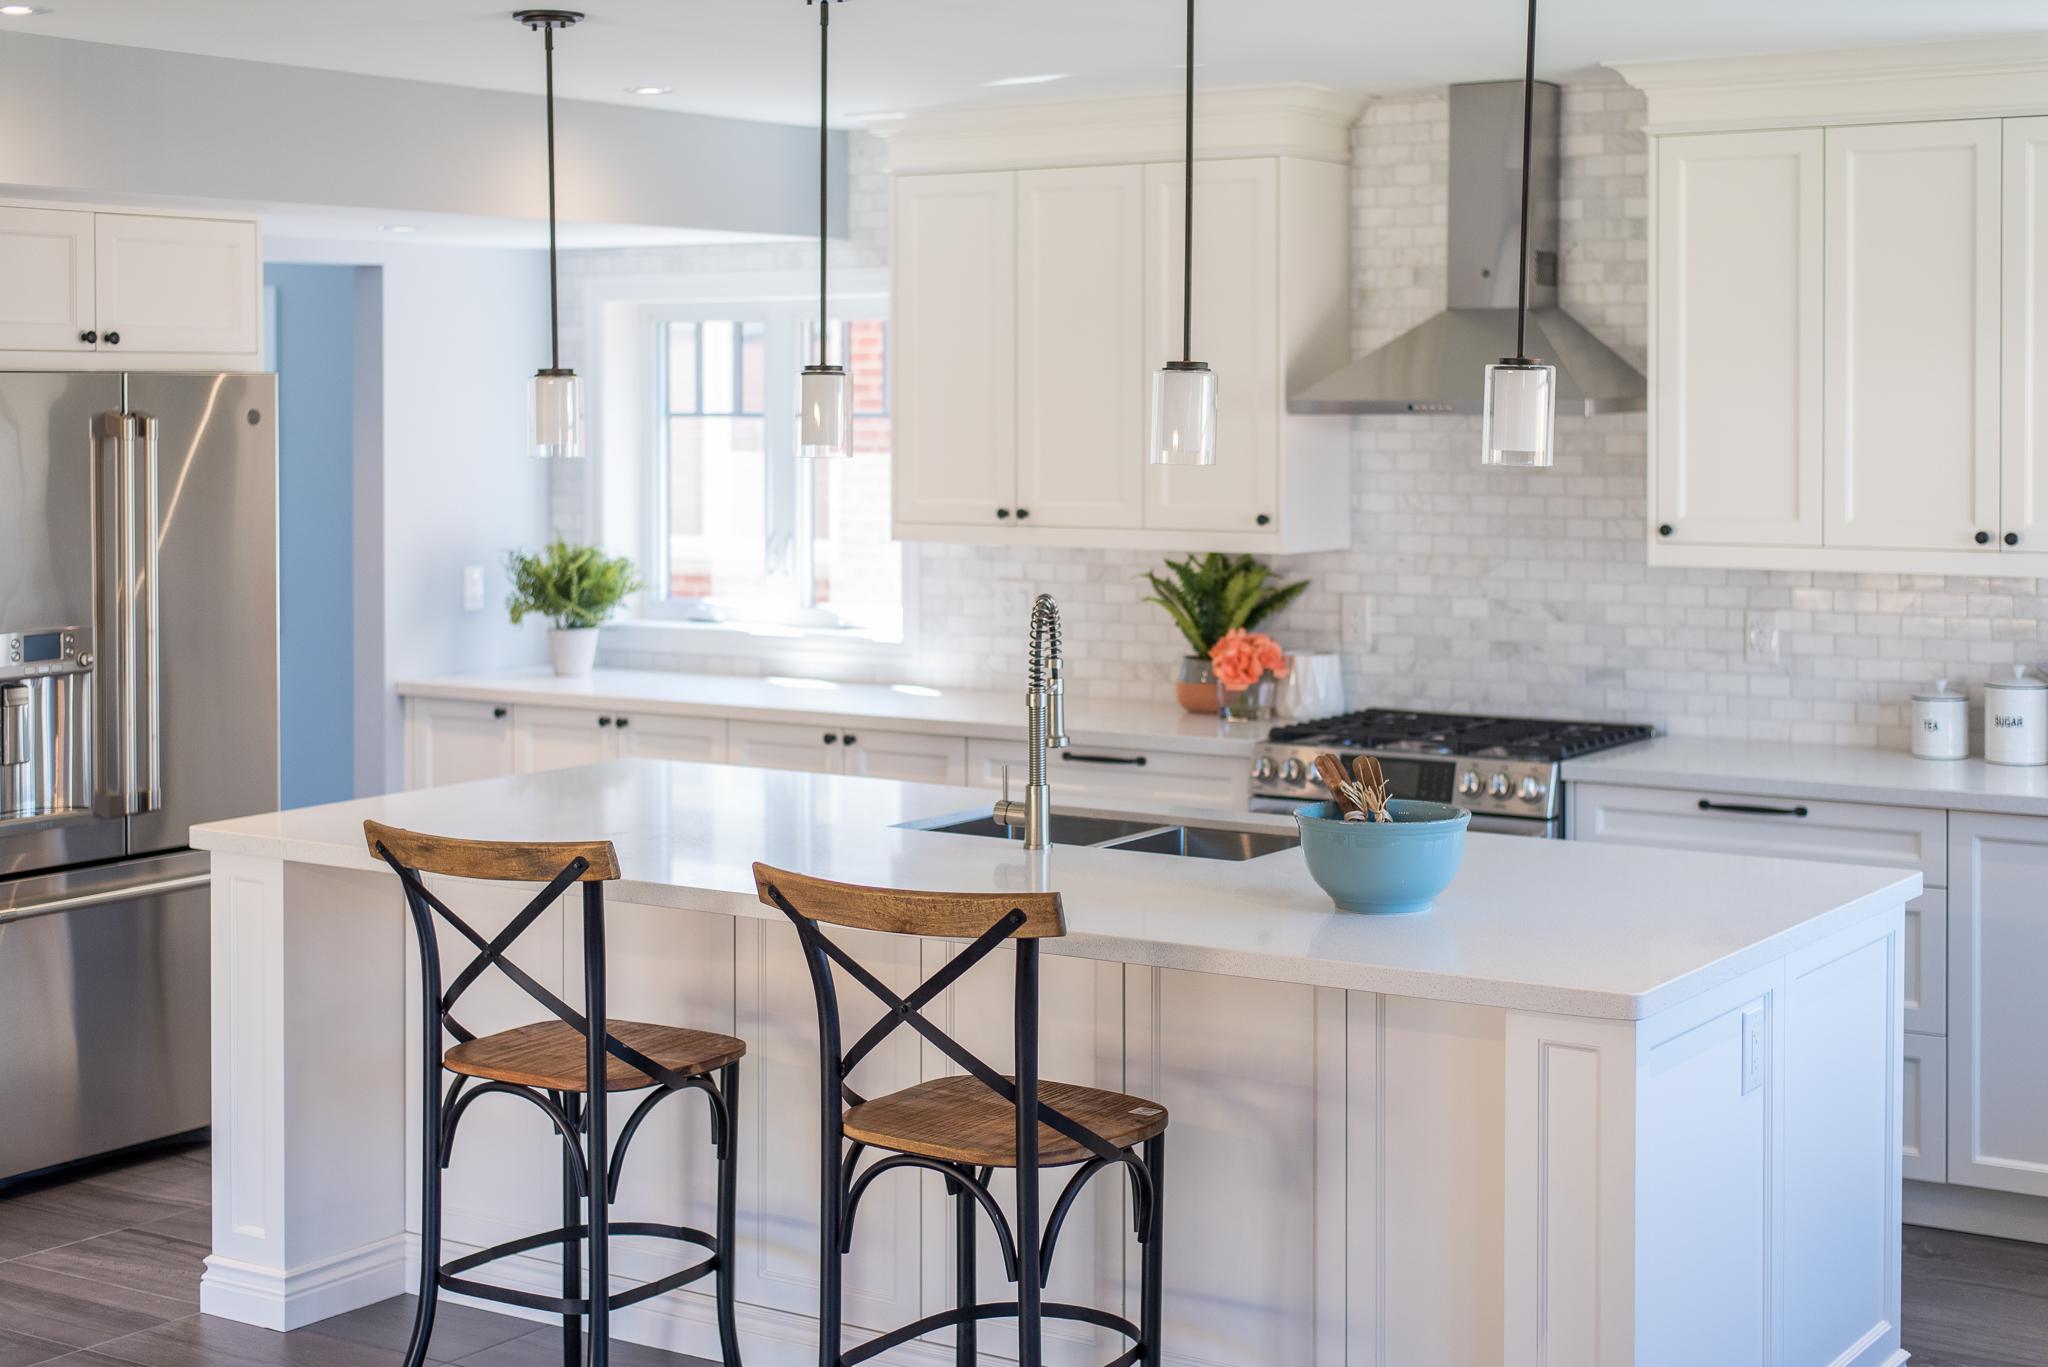 Hamilton Commercial Photographer - Interiors - Kitchen 001.JPG